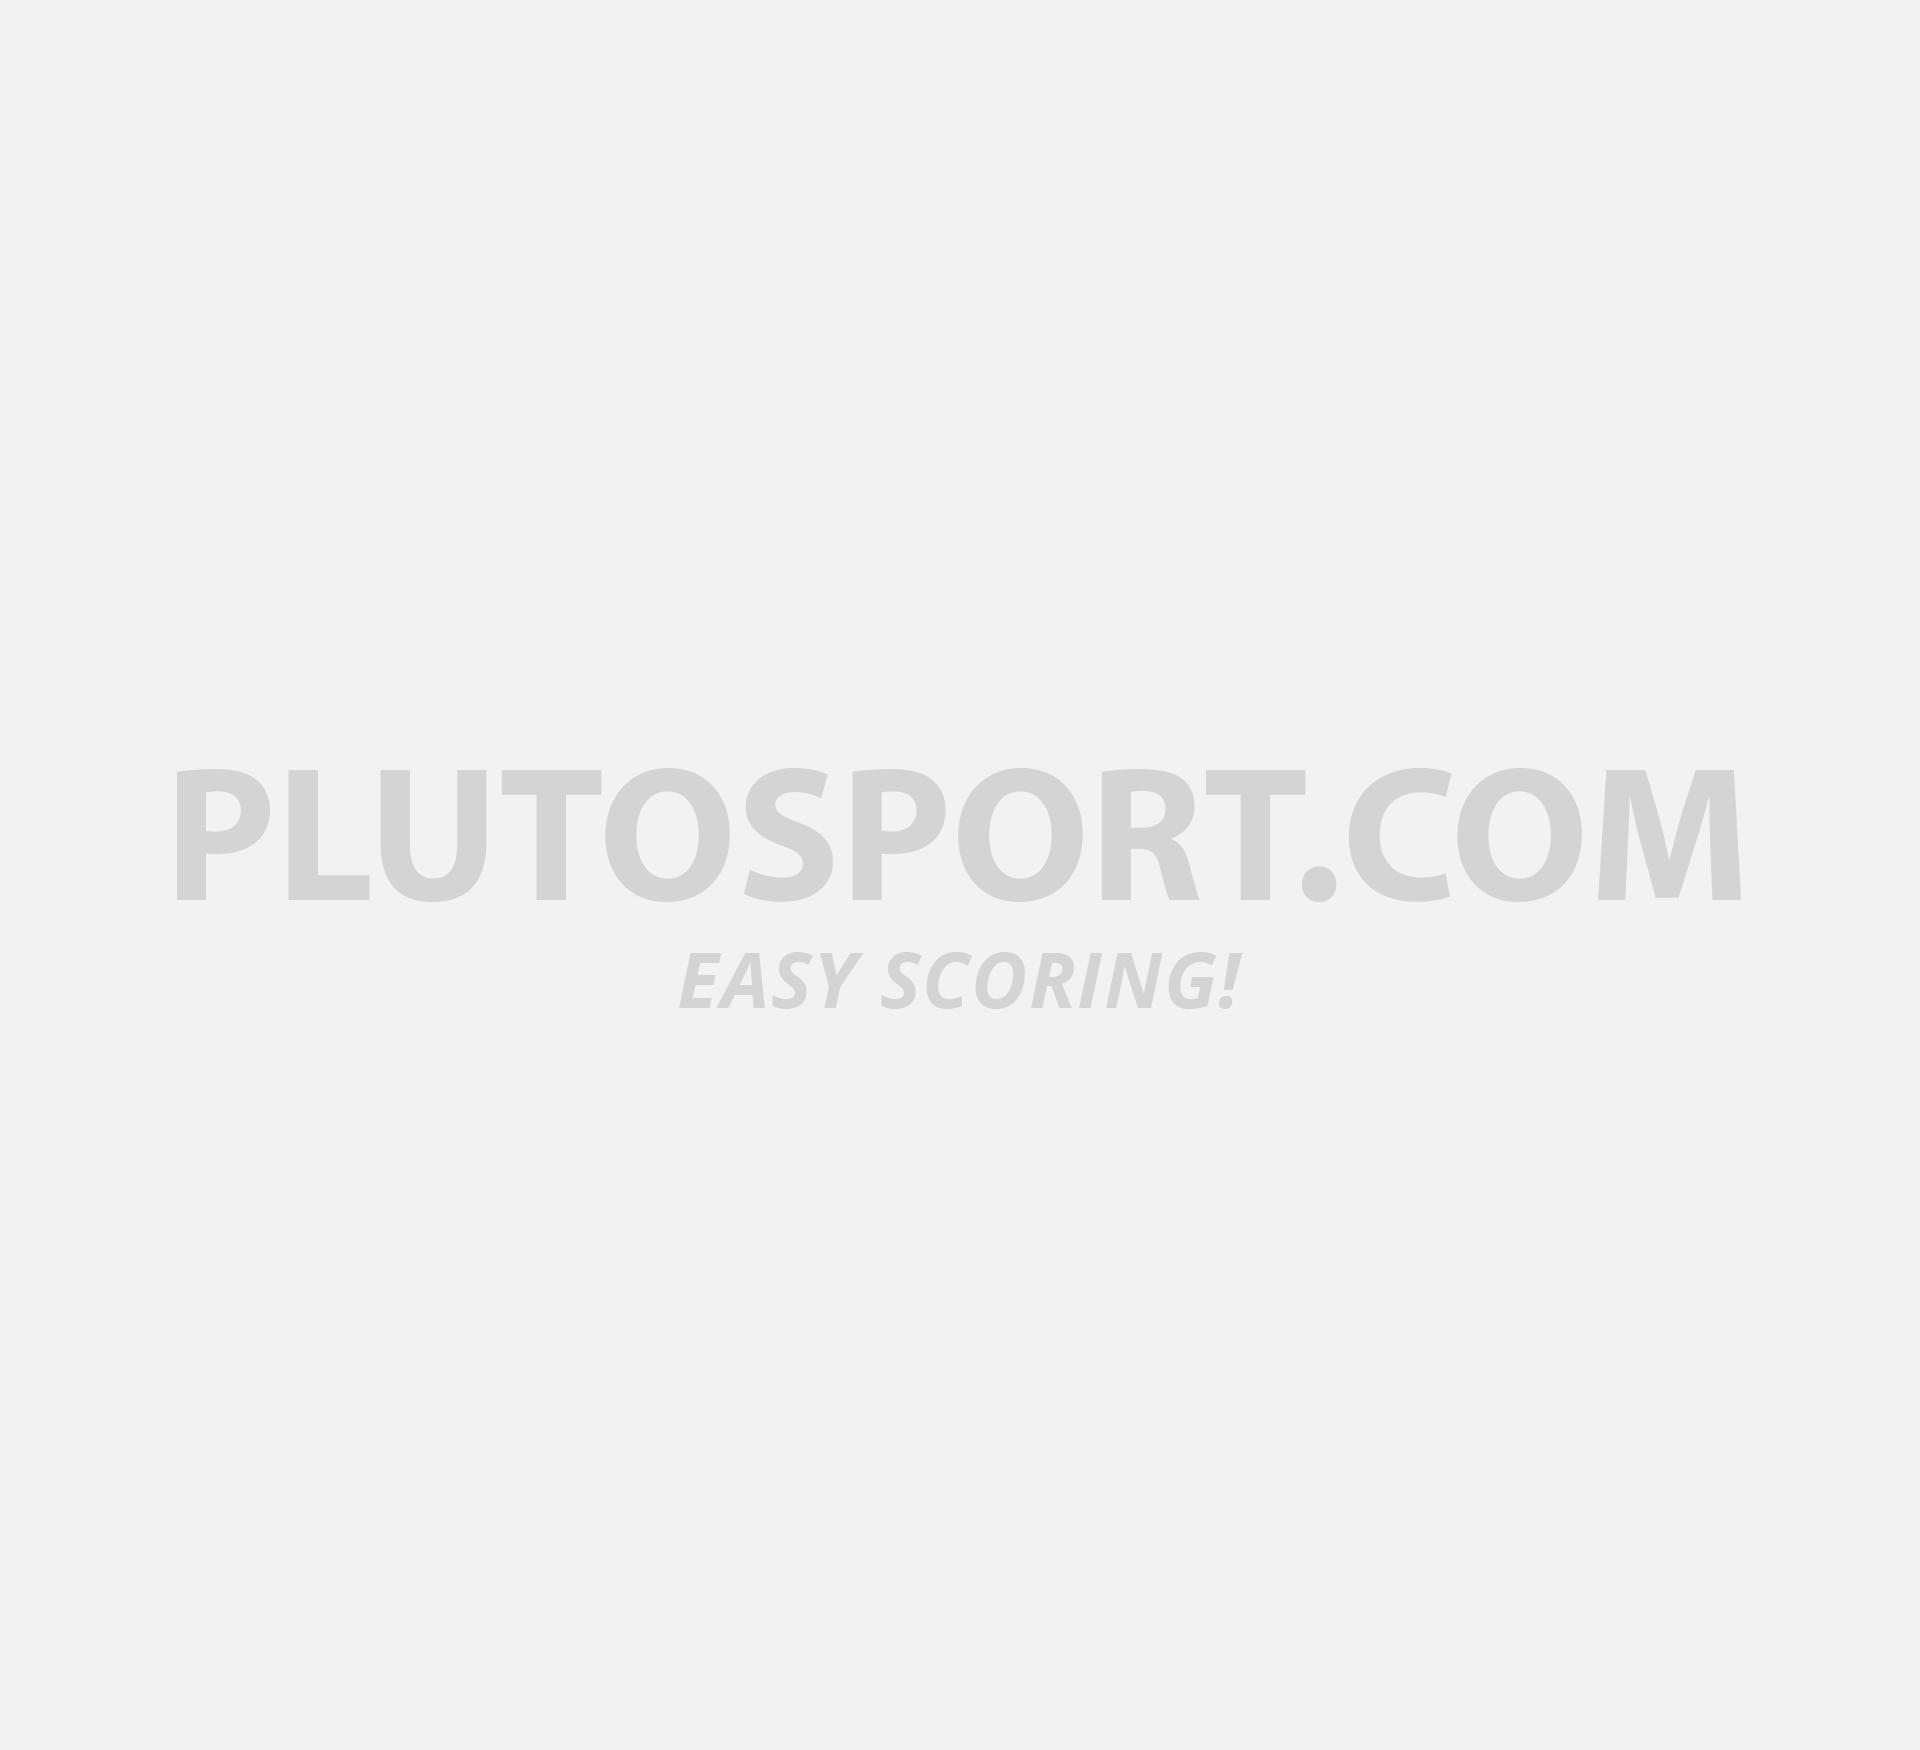 51ff7bf54 Adidas Predator Absolado Instinct Indoor Football Shoes Junior - Boots  indoor - Shoes - Football - Sports | Plutosport